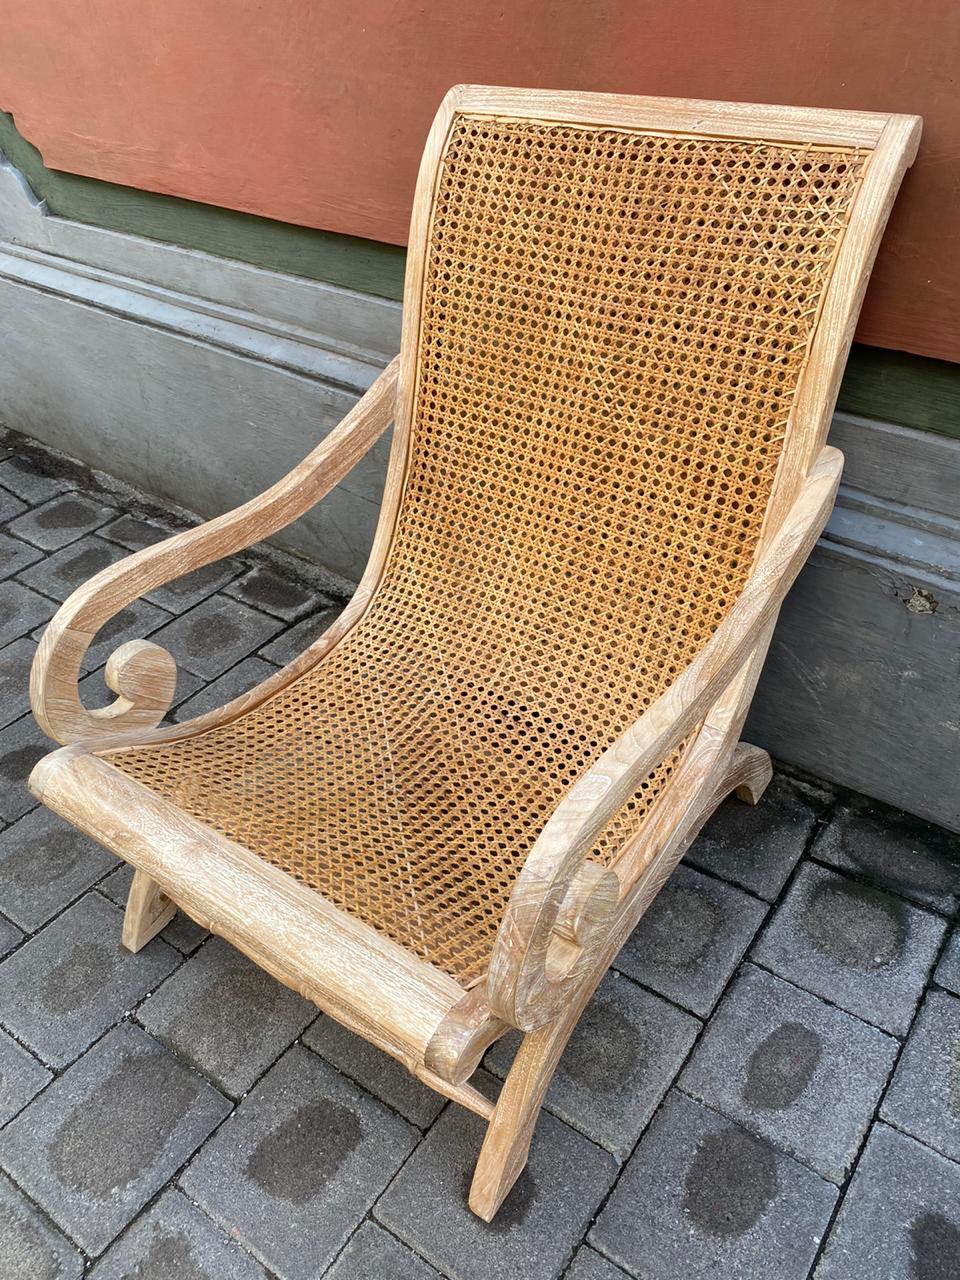 Rattan lazy chair - Kaliuda Gallery Bali